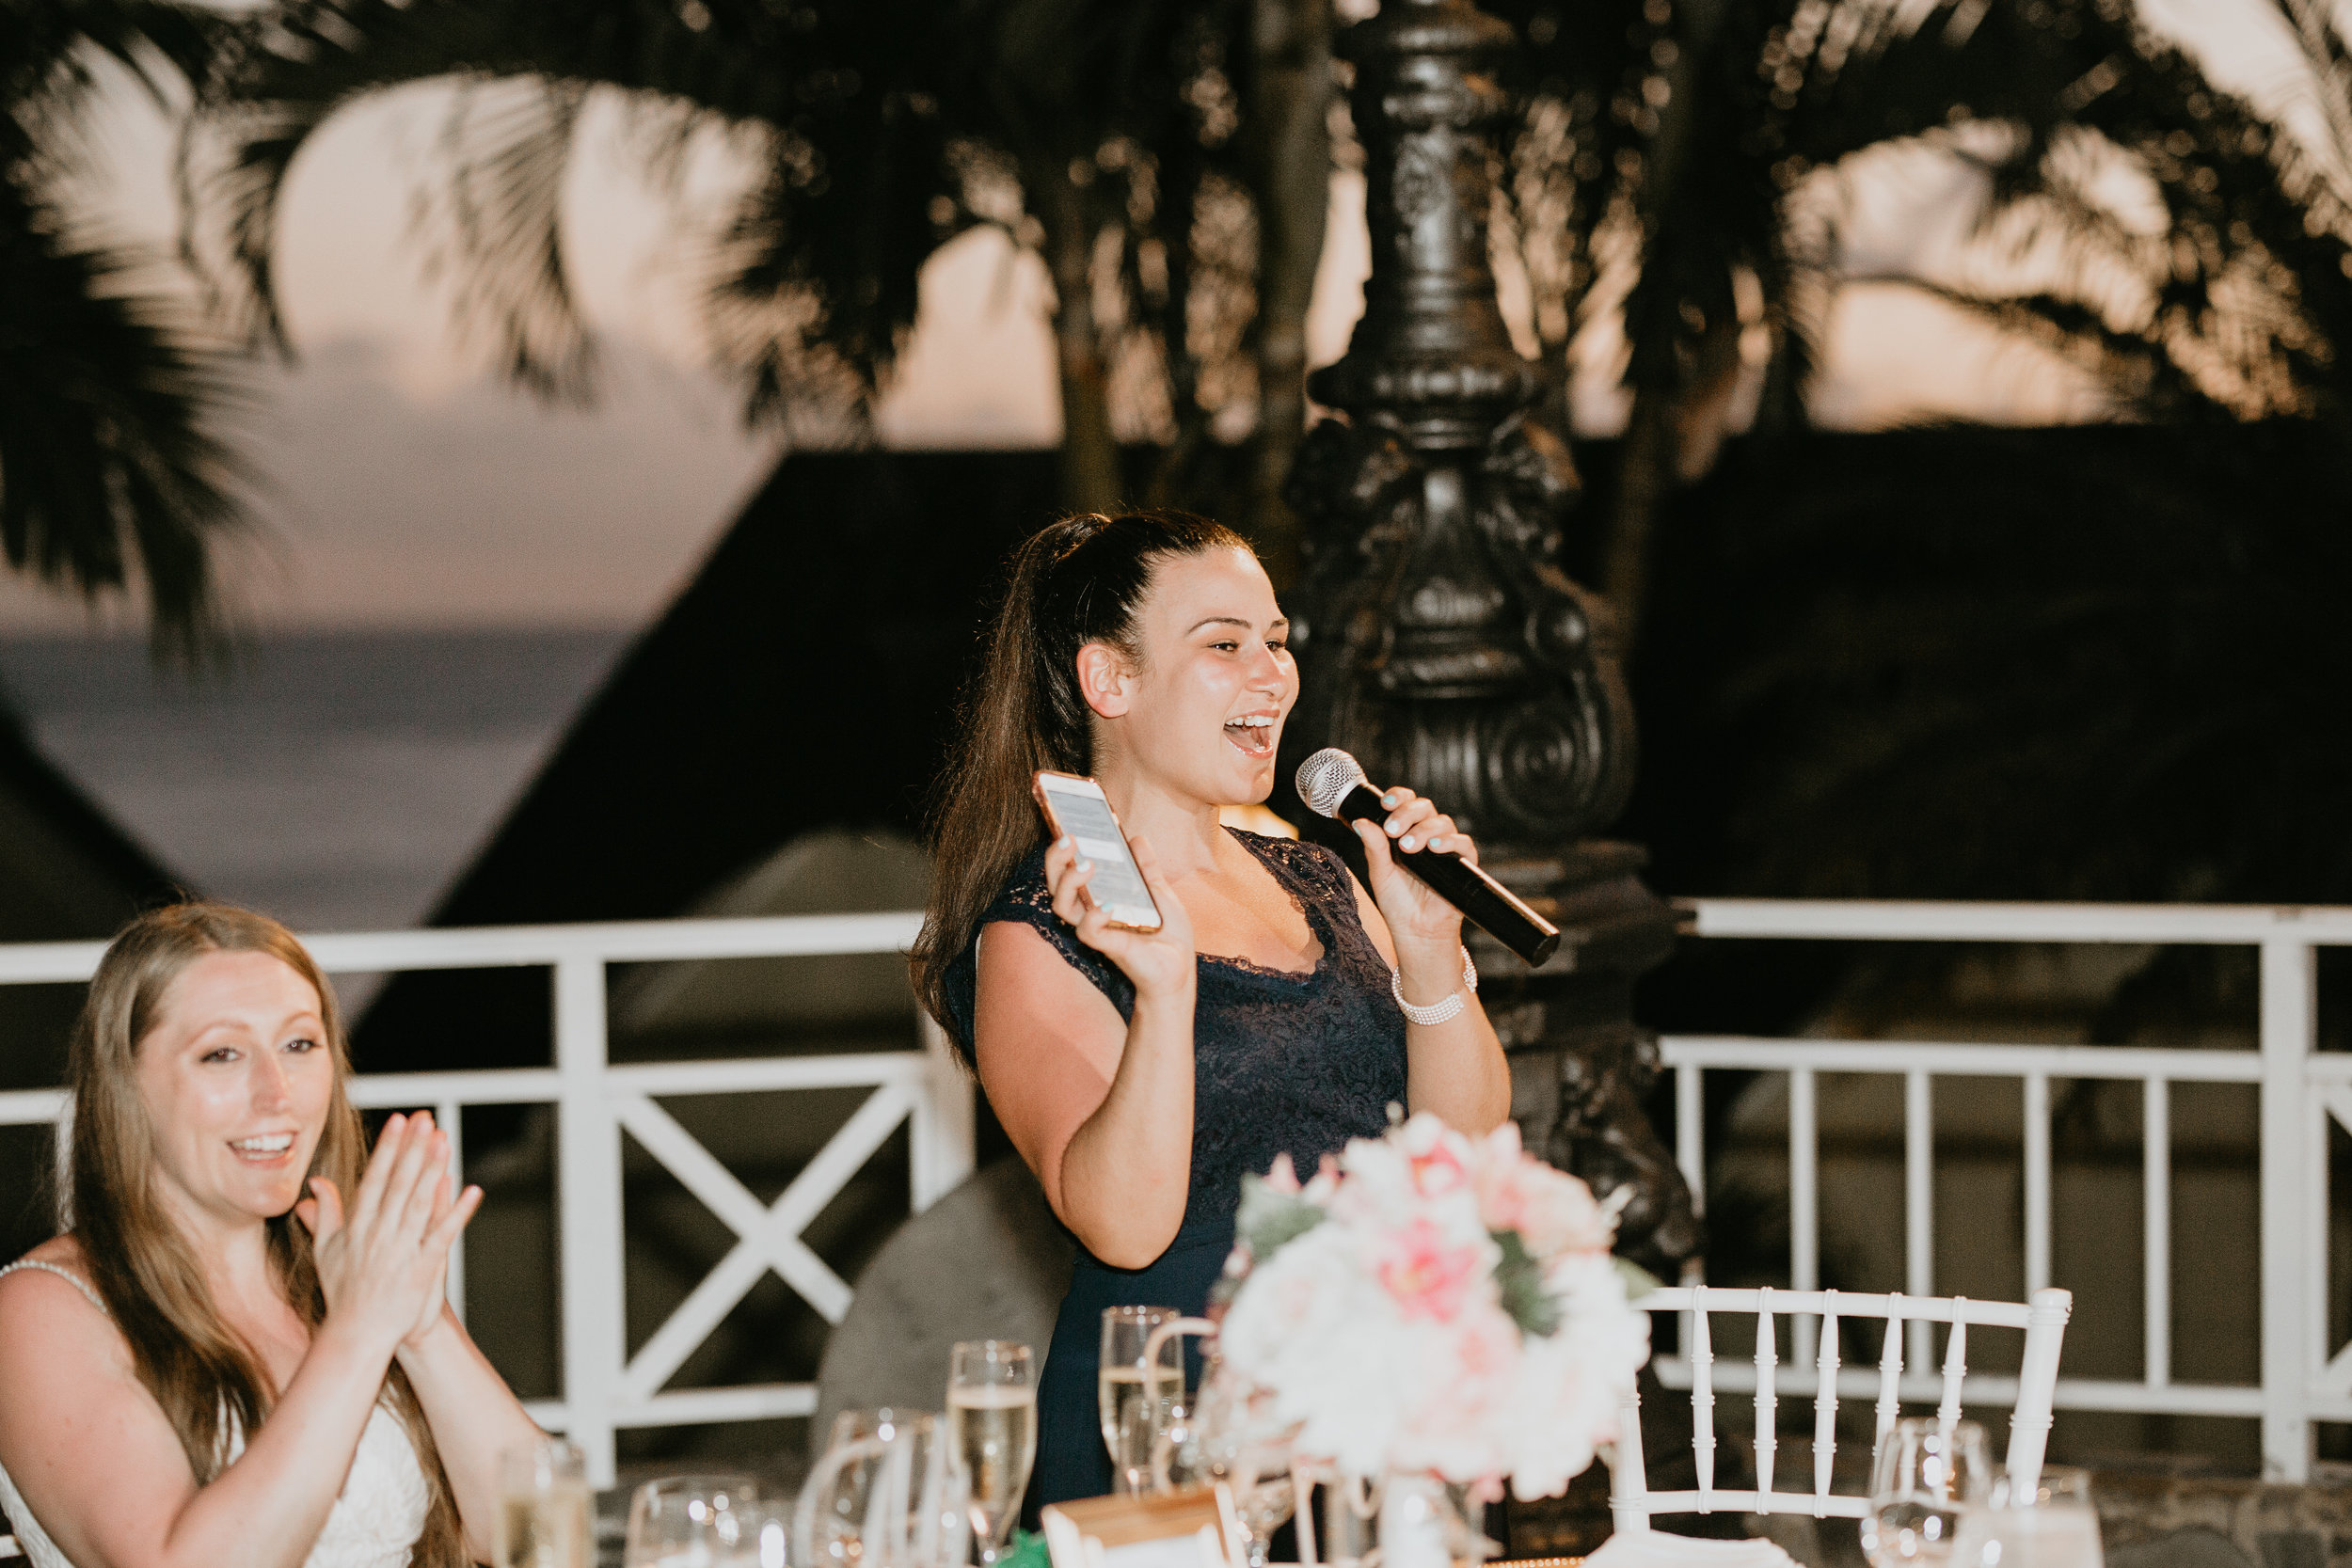 nicole-daacke-photography-destination-wedding-in-st-lucia-sandals-la-toc-intimate-island-wedding-carribean-elopement-photographer-chill-island-wedding-144.jpg